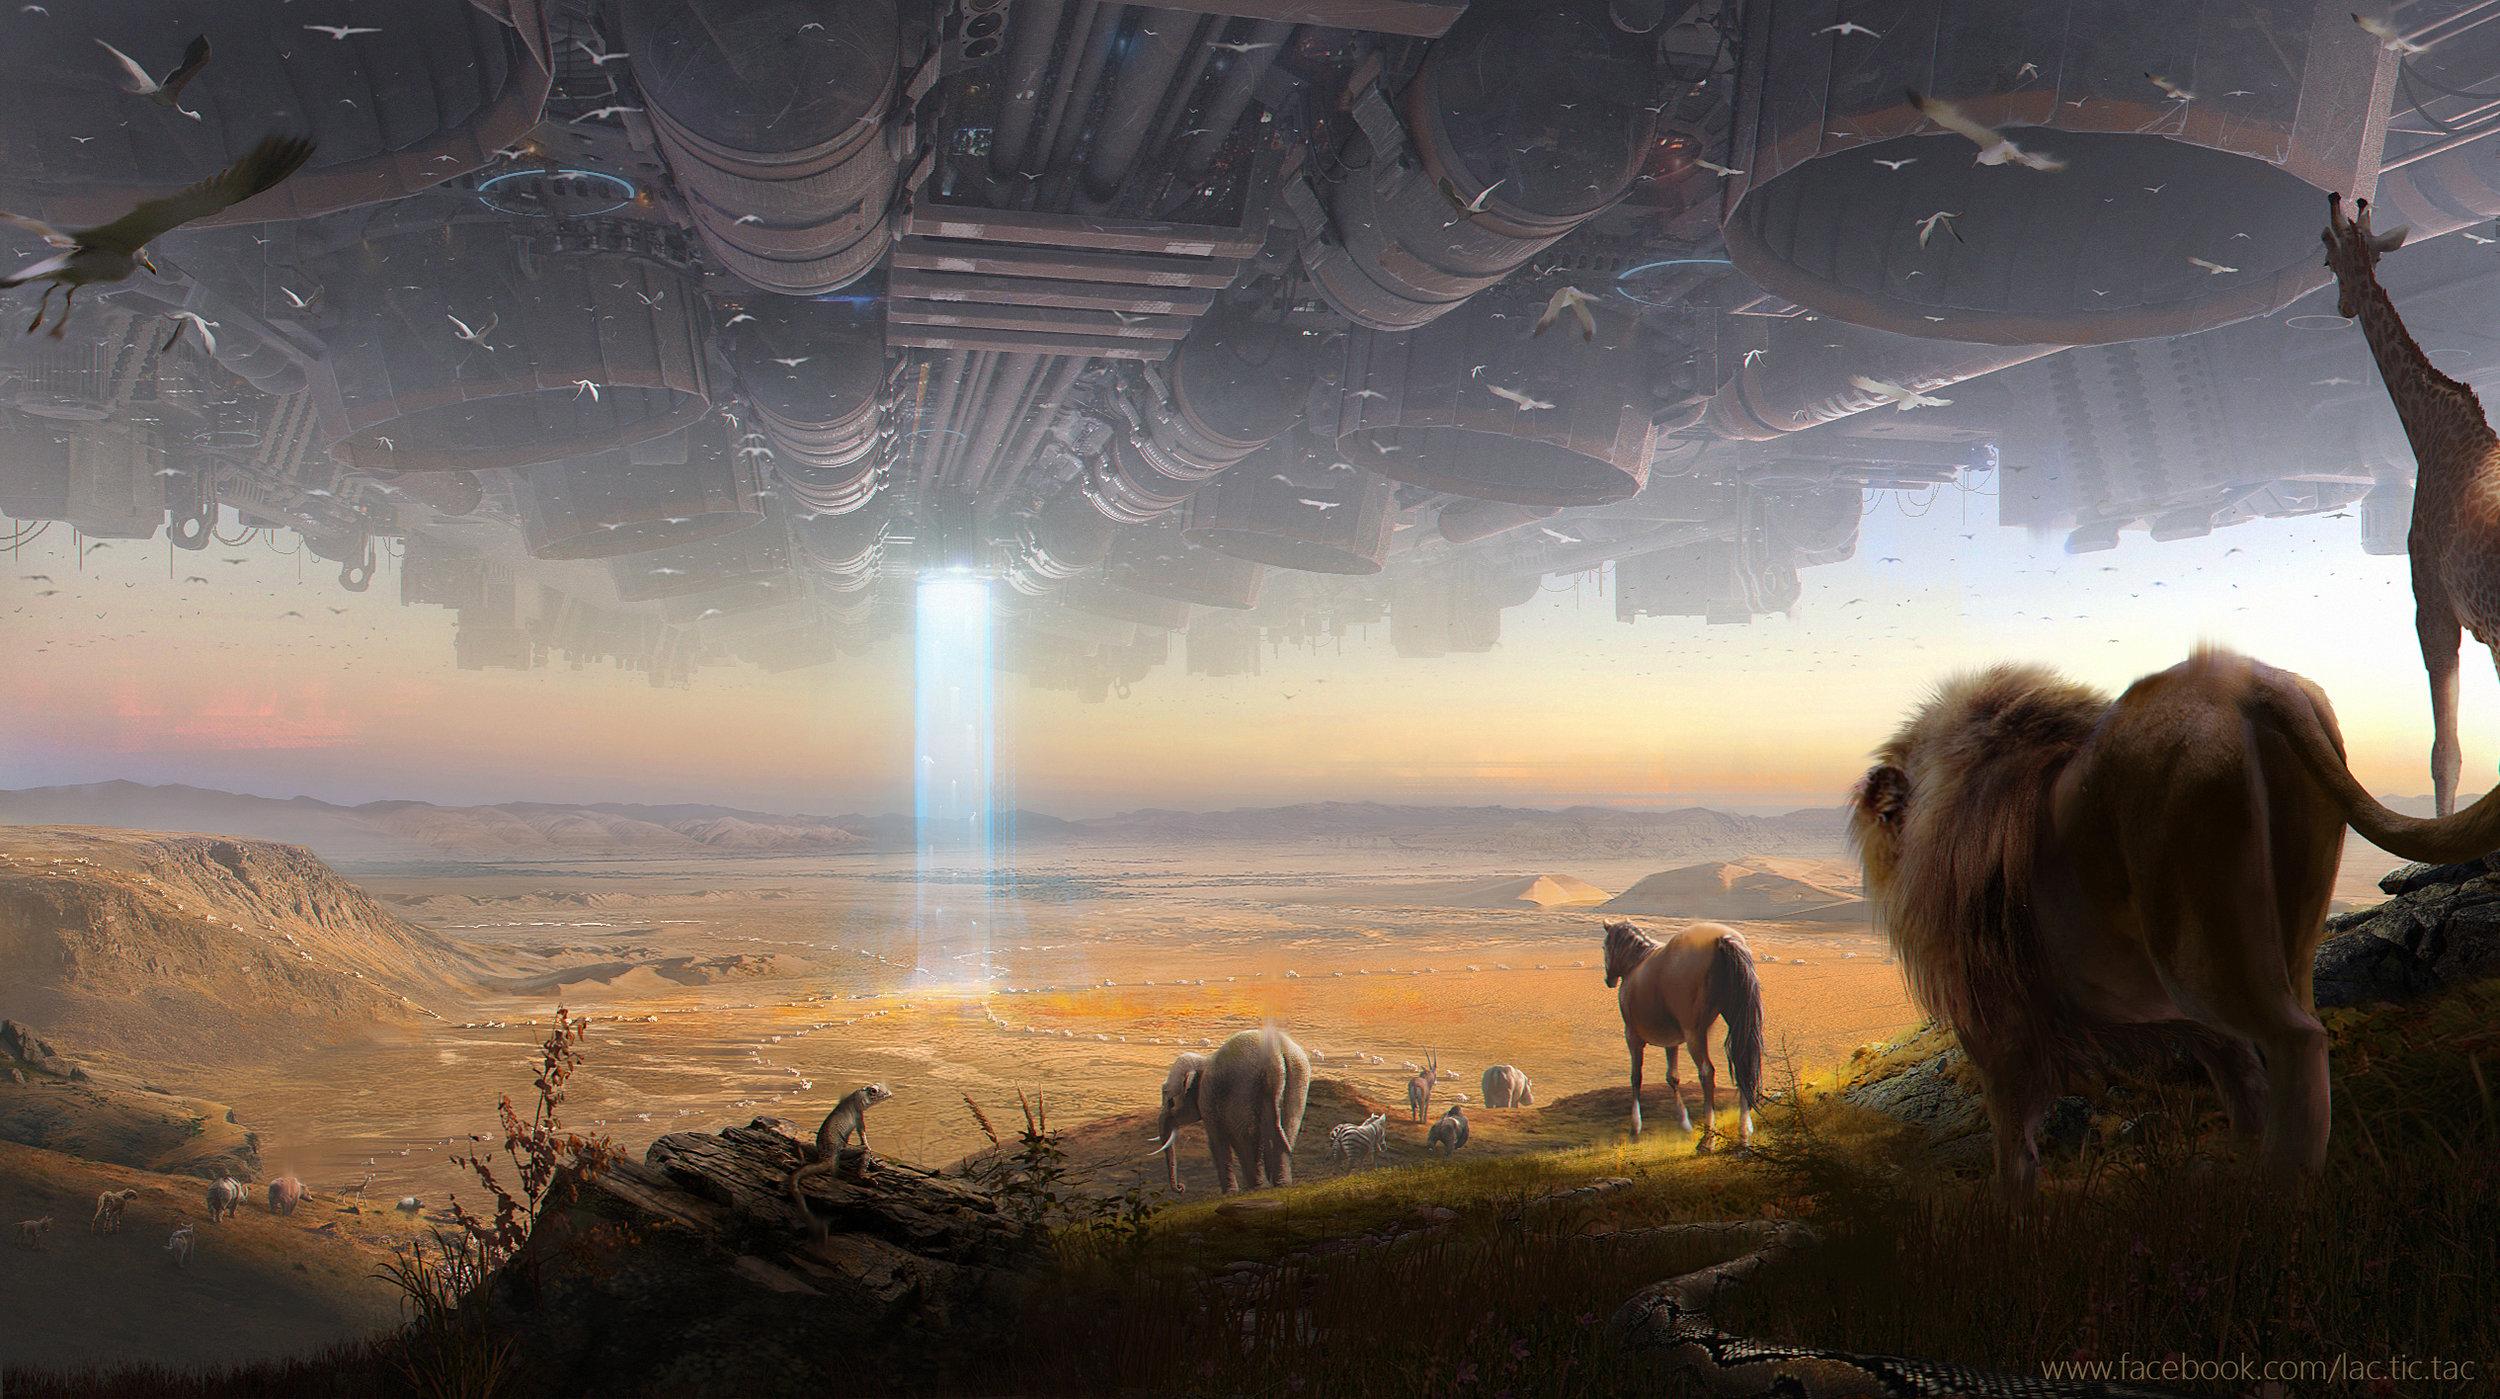 1351-noahs-interstellar-ark-andrew-palyanov